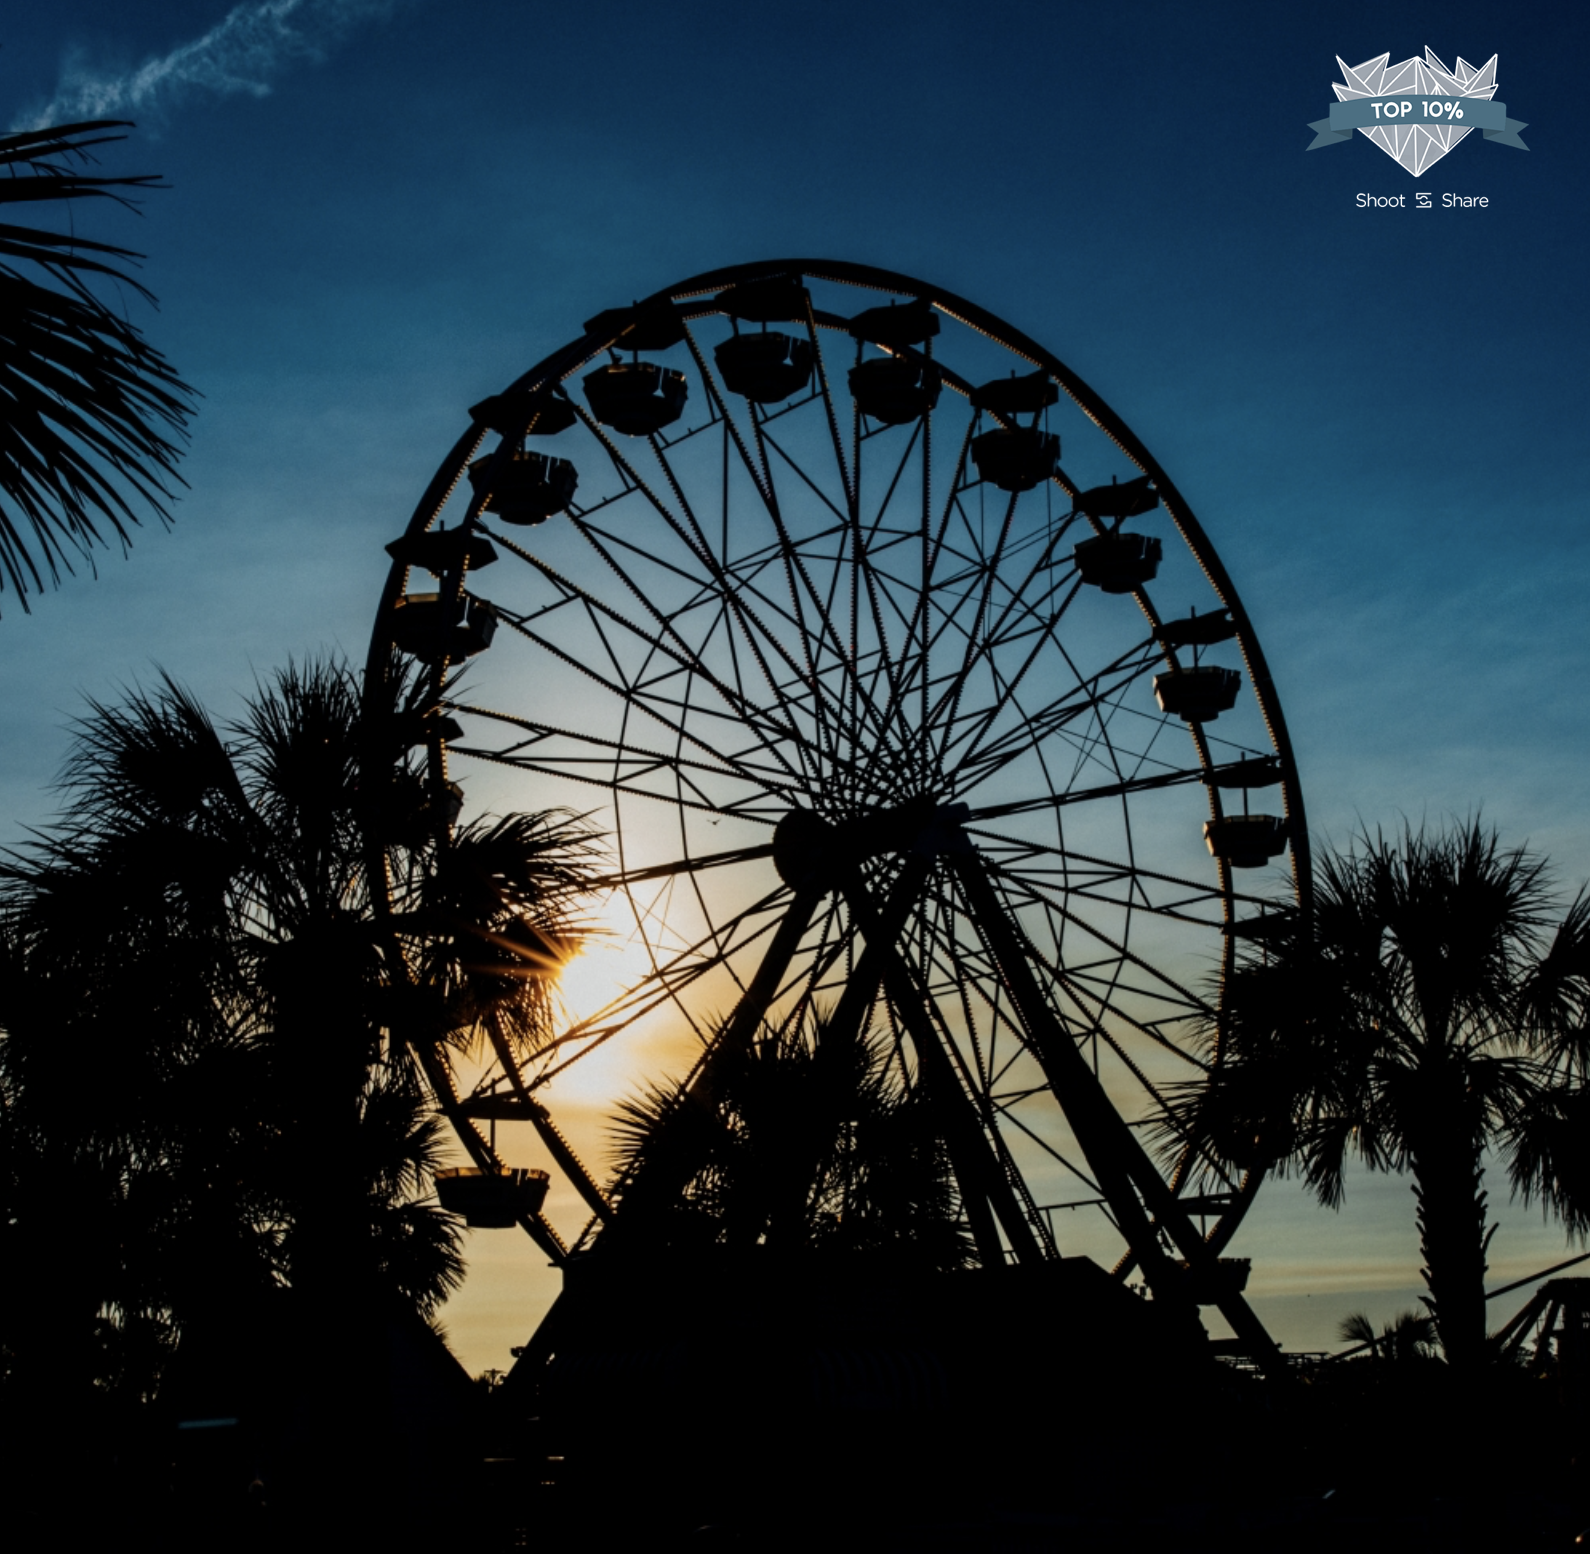 Silhouette of Ferris wheel in Myrtle Beach South Carolina